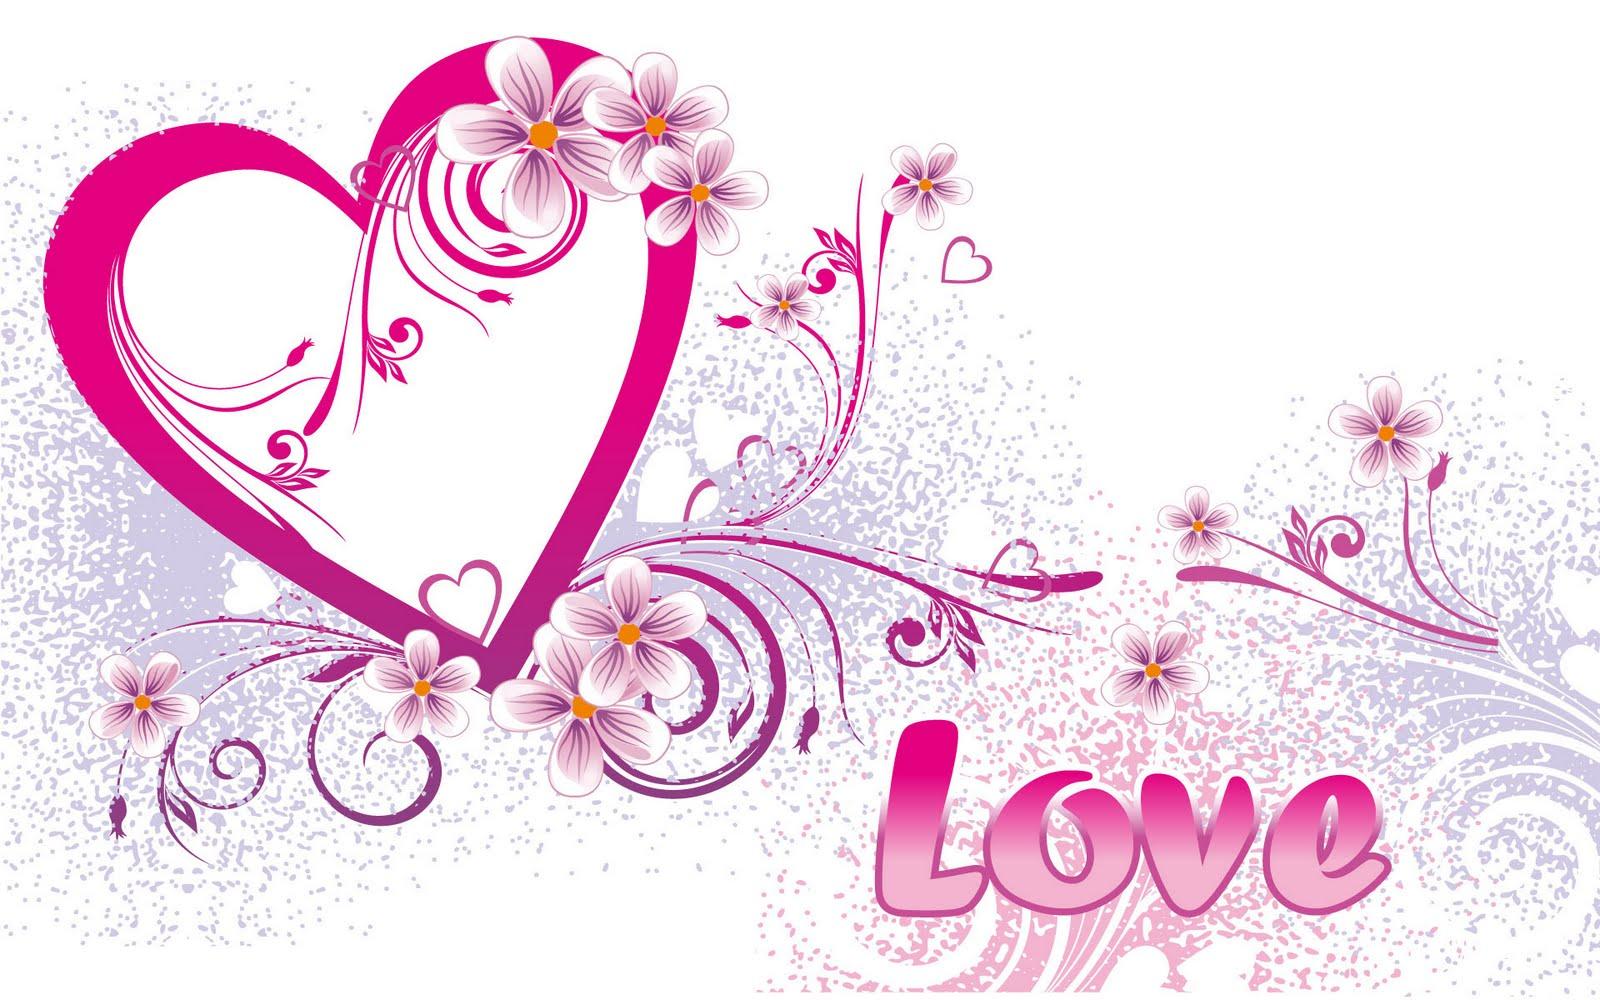 http://3.bp.blogspot.com/-s4GdYo-o_qs/TWJDiqwazbI/AAAAAAAAAAY/Vvq9eVT35fg/s1600/Love-wallpaper-love-4187632-1920-1200%255B1%255D.jpg